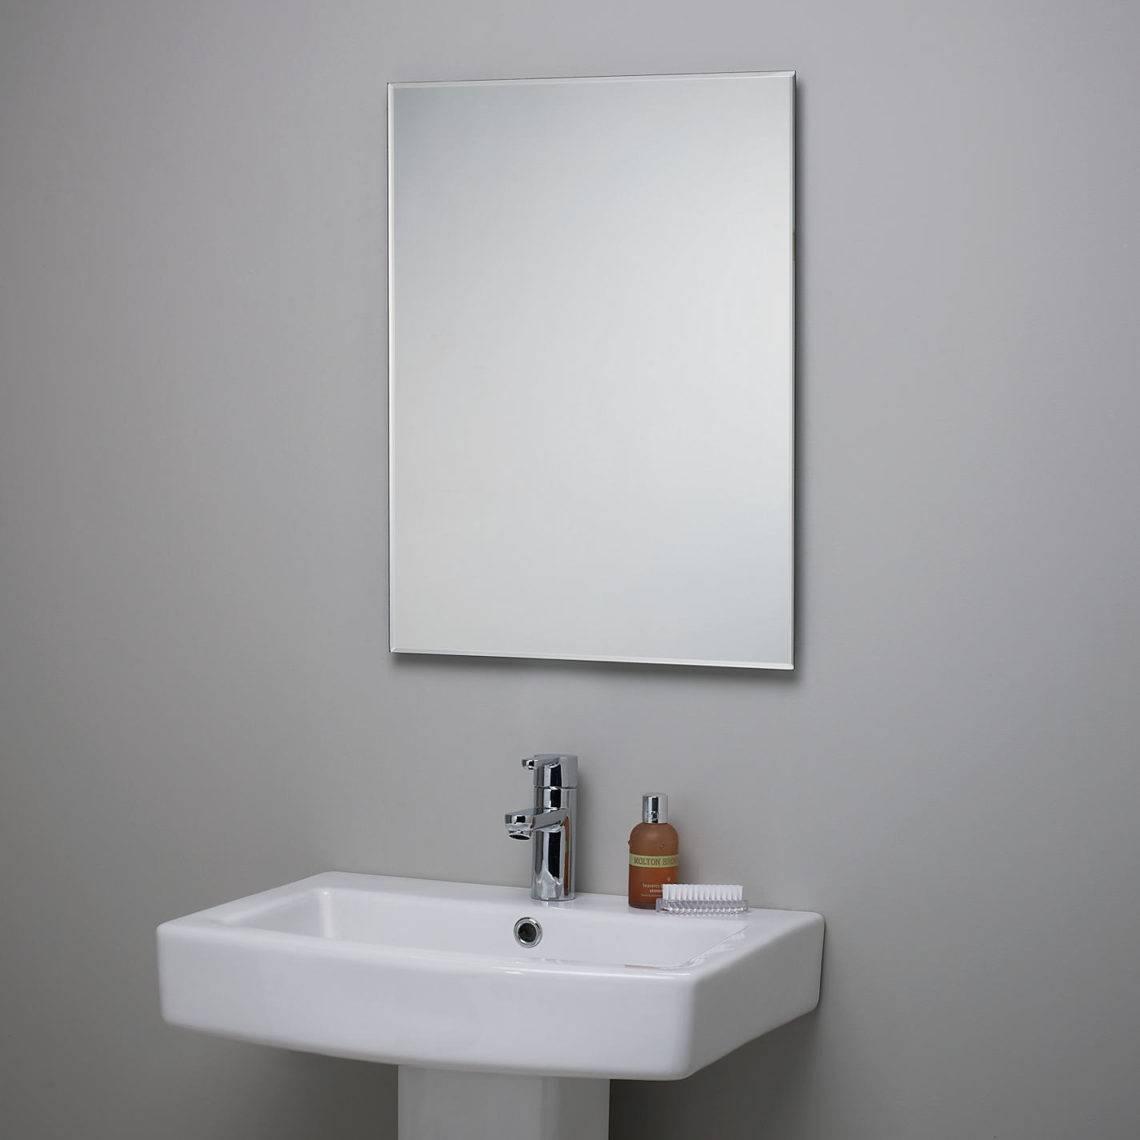 Frameless Bathroom Mirror Large – Harpsounds.co inside Large Frameless Mirrors (Image 6 of 25)